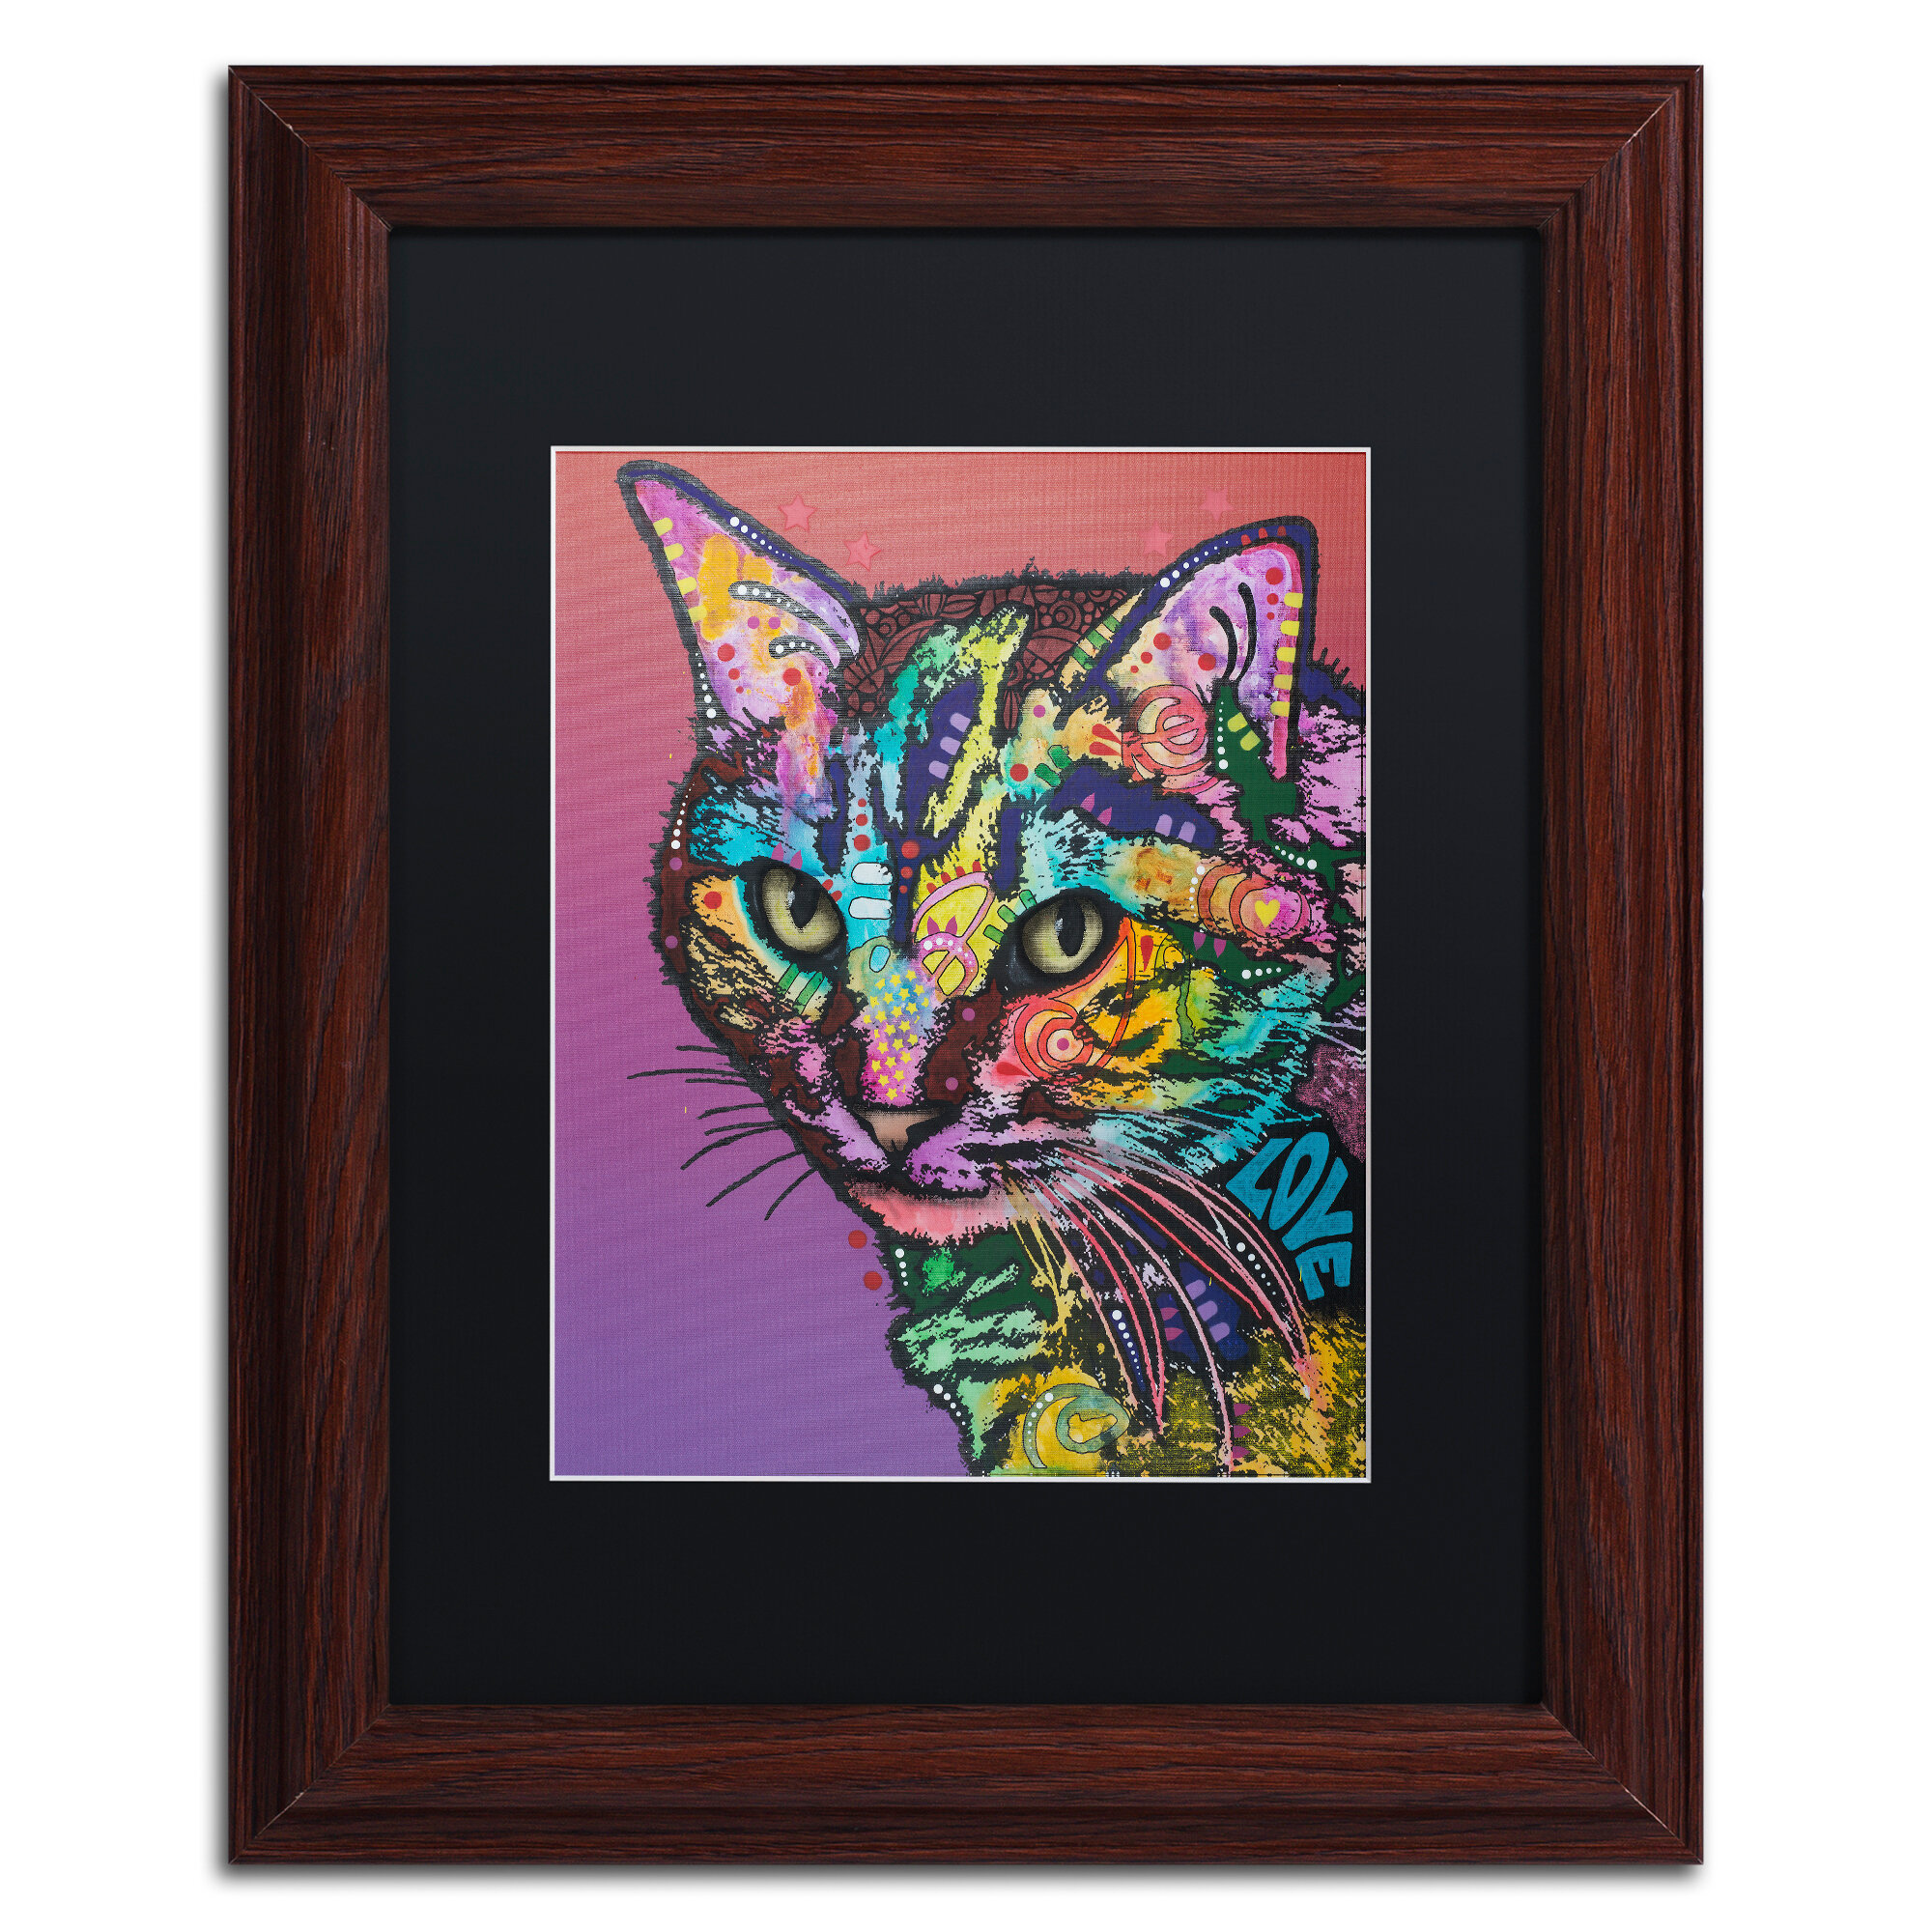 Trademark Art Lucy Custom 4 Framed Graphic Art Print Wayfair